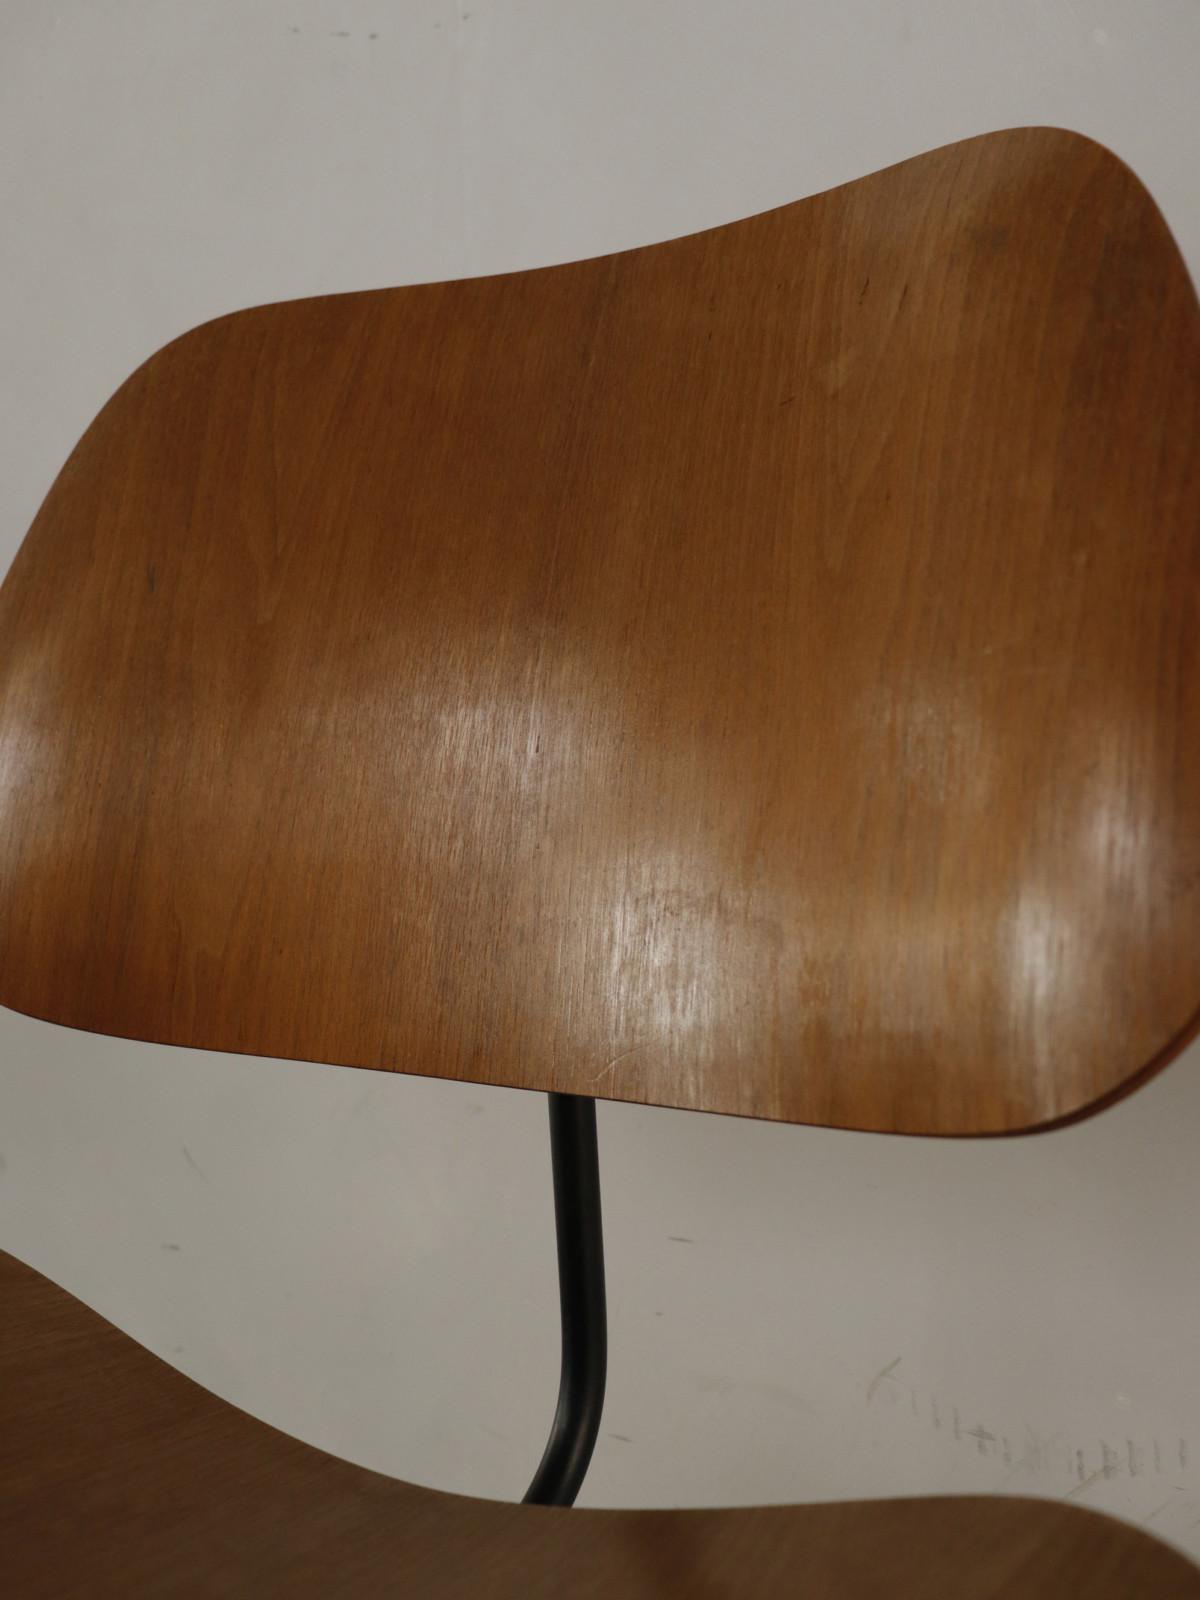 Eames,1950's,lcm,USA